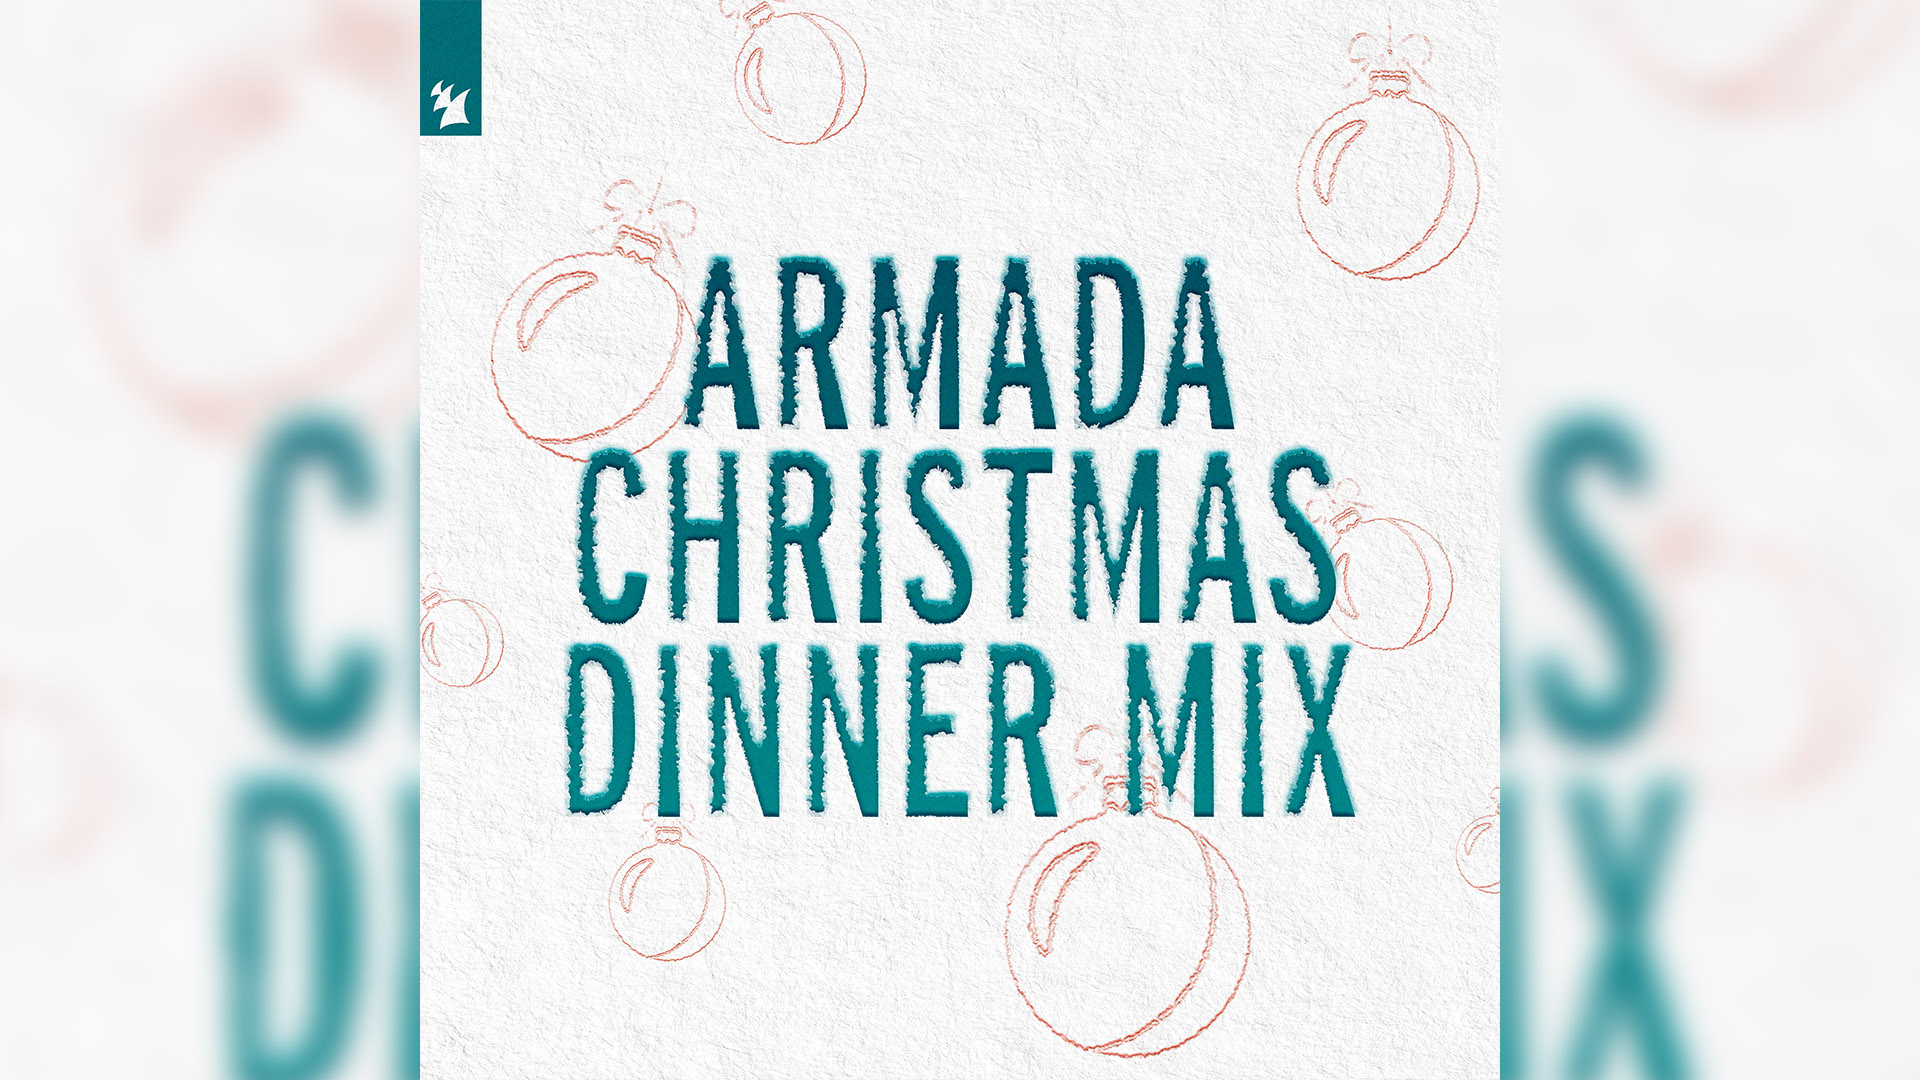 Armada Christmas Dinner Mix